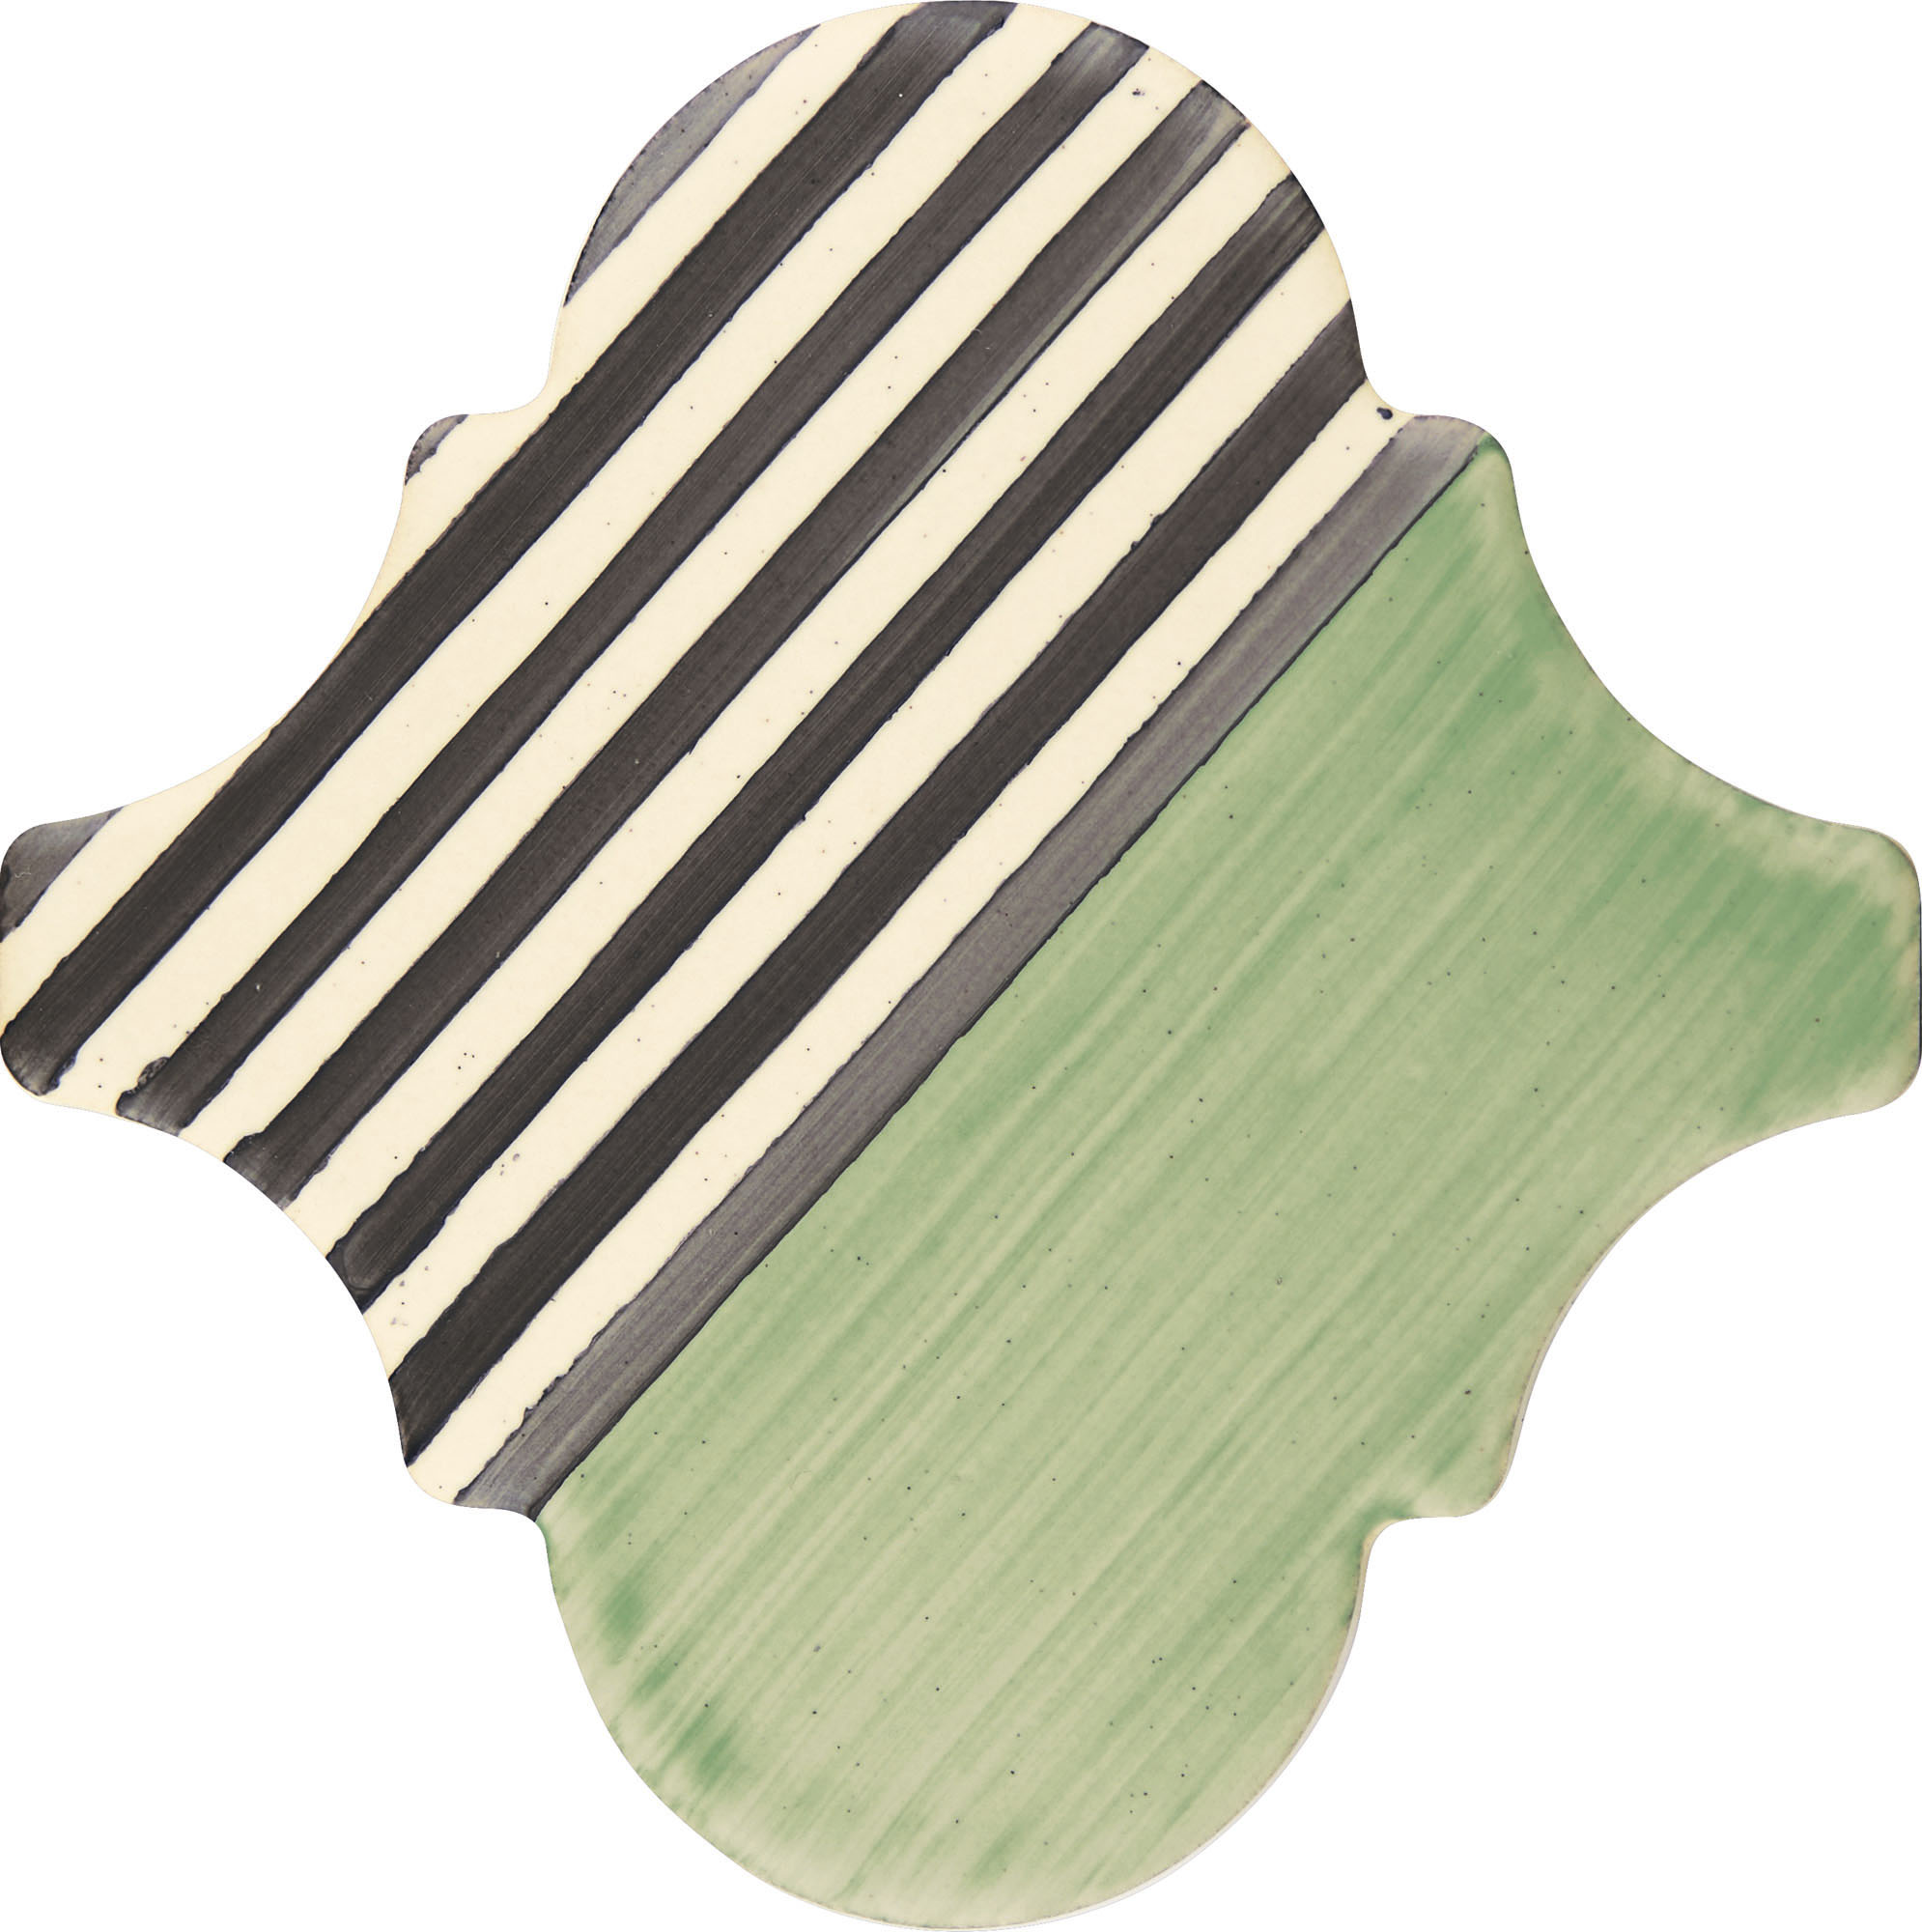 PF009 Color Art Green Stripes Arabesque